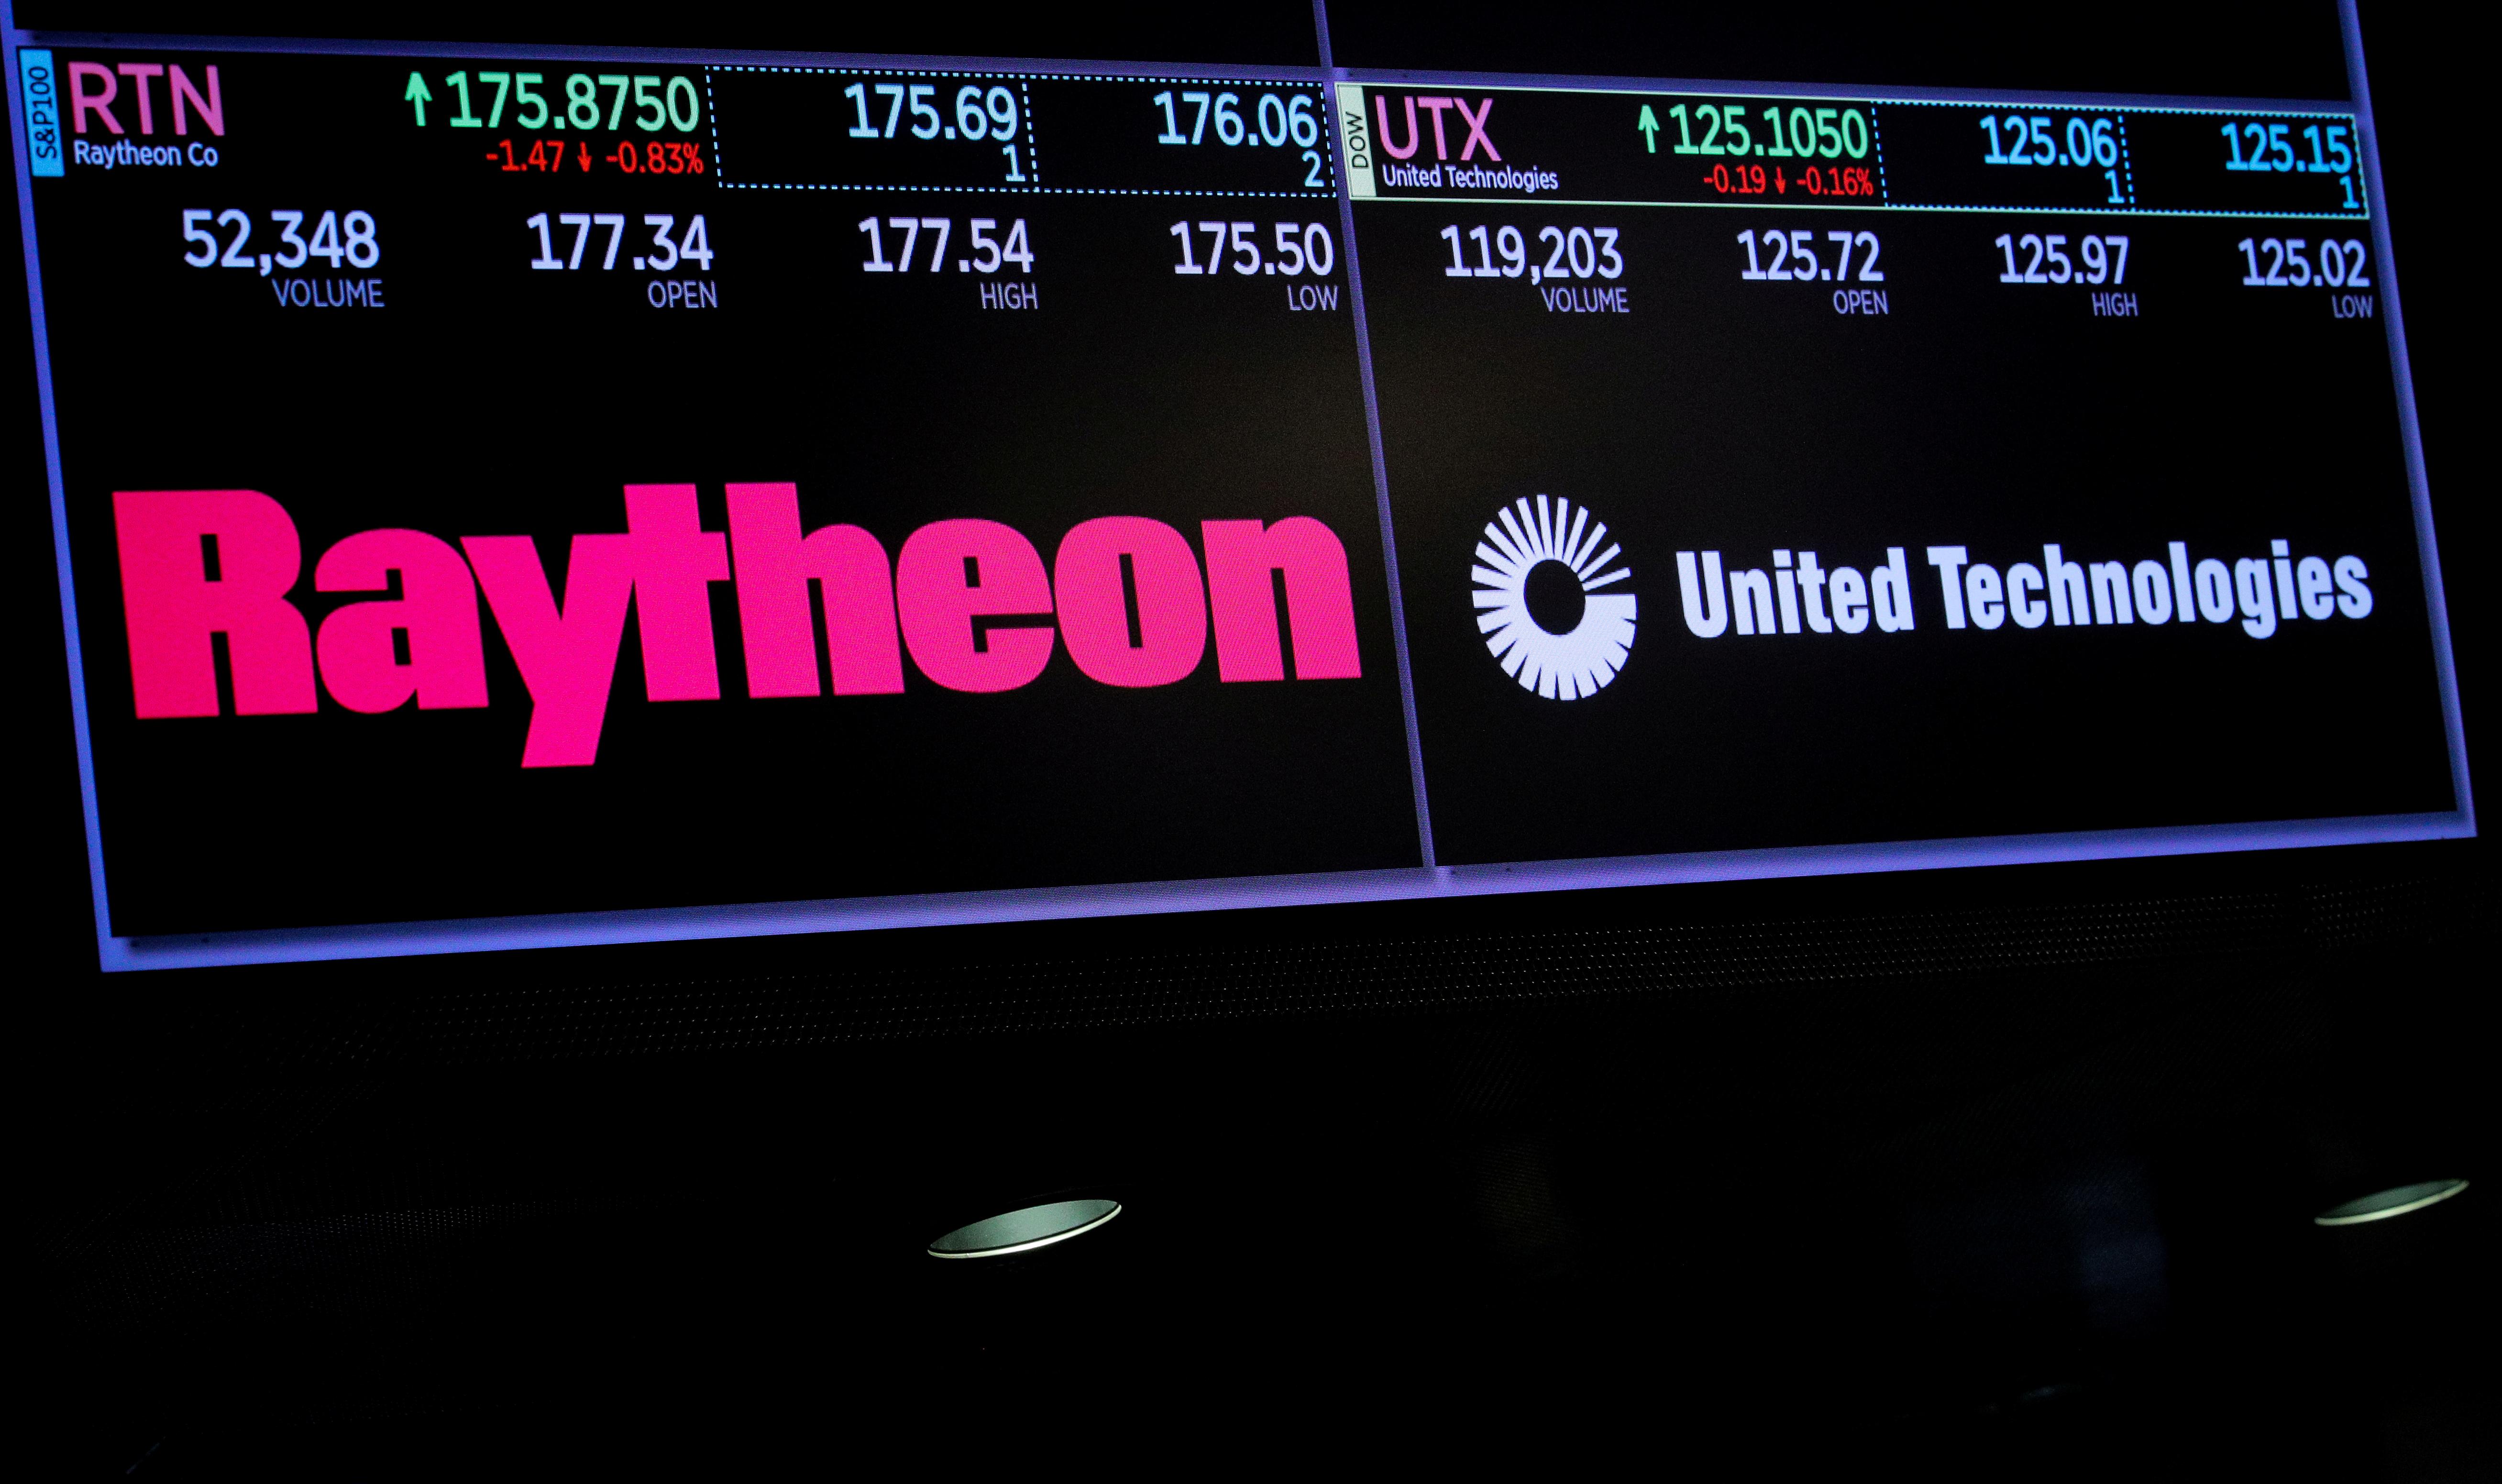 United Technologies, Raytheon offer EU concessions over $120 billion merger deal